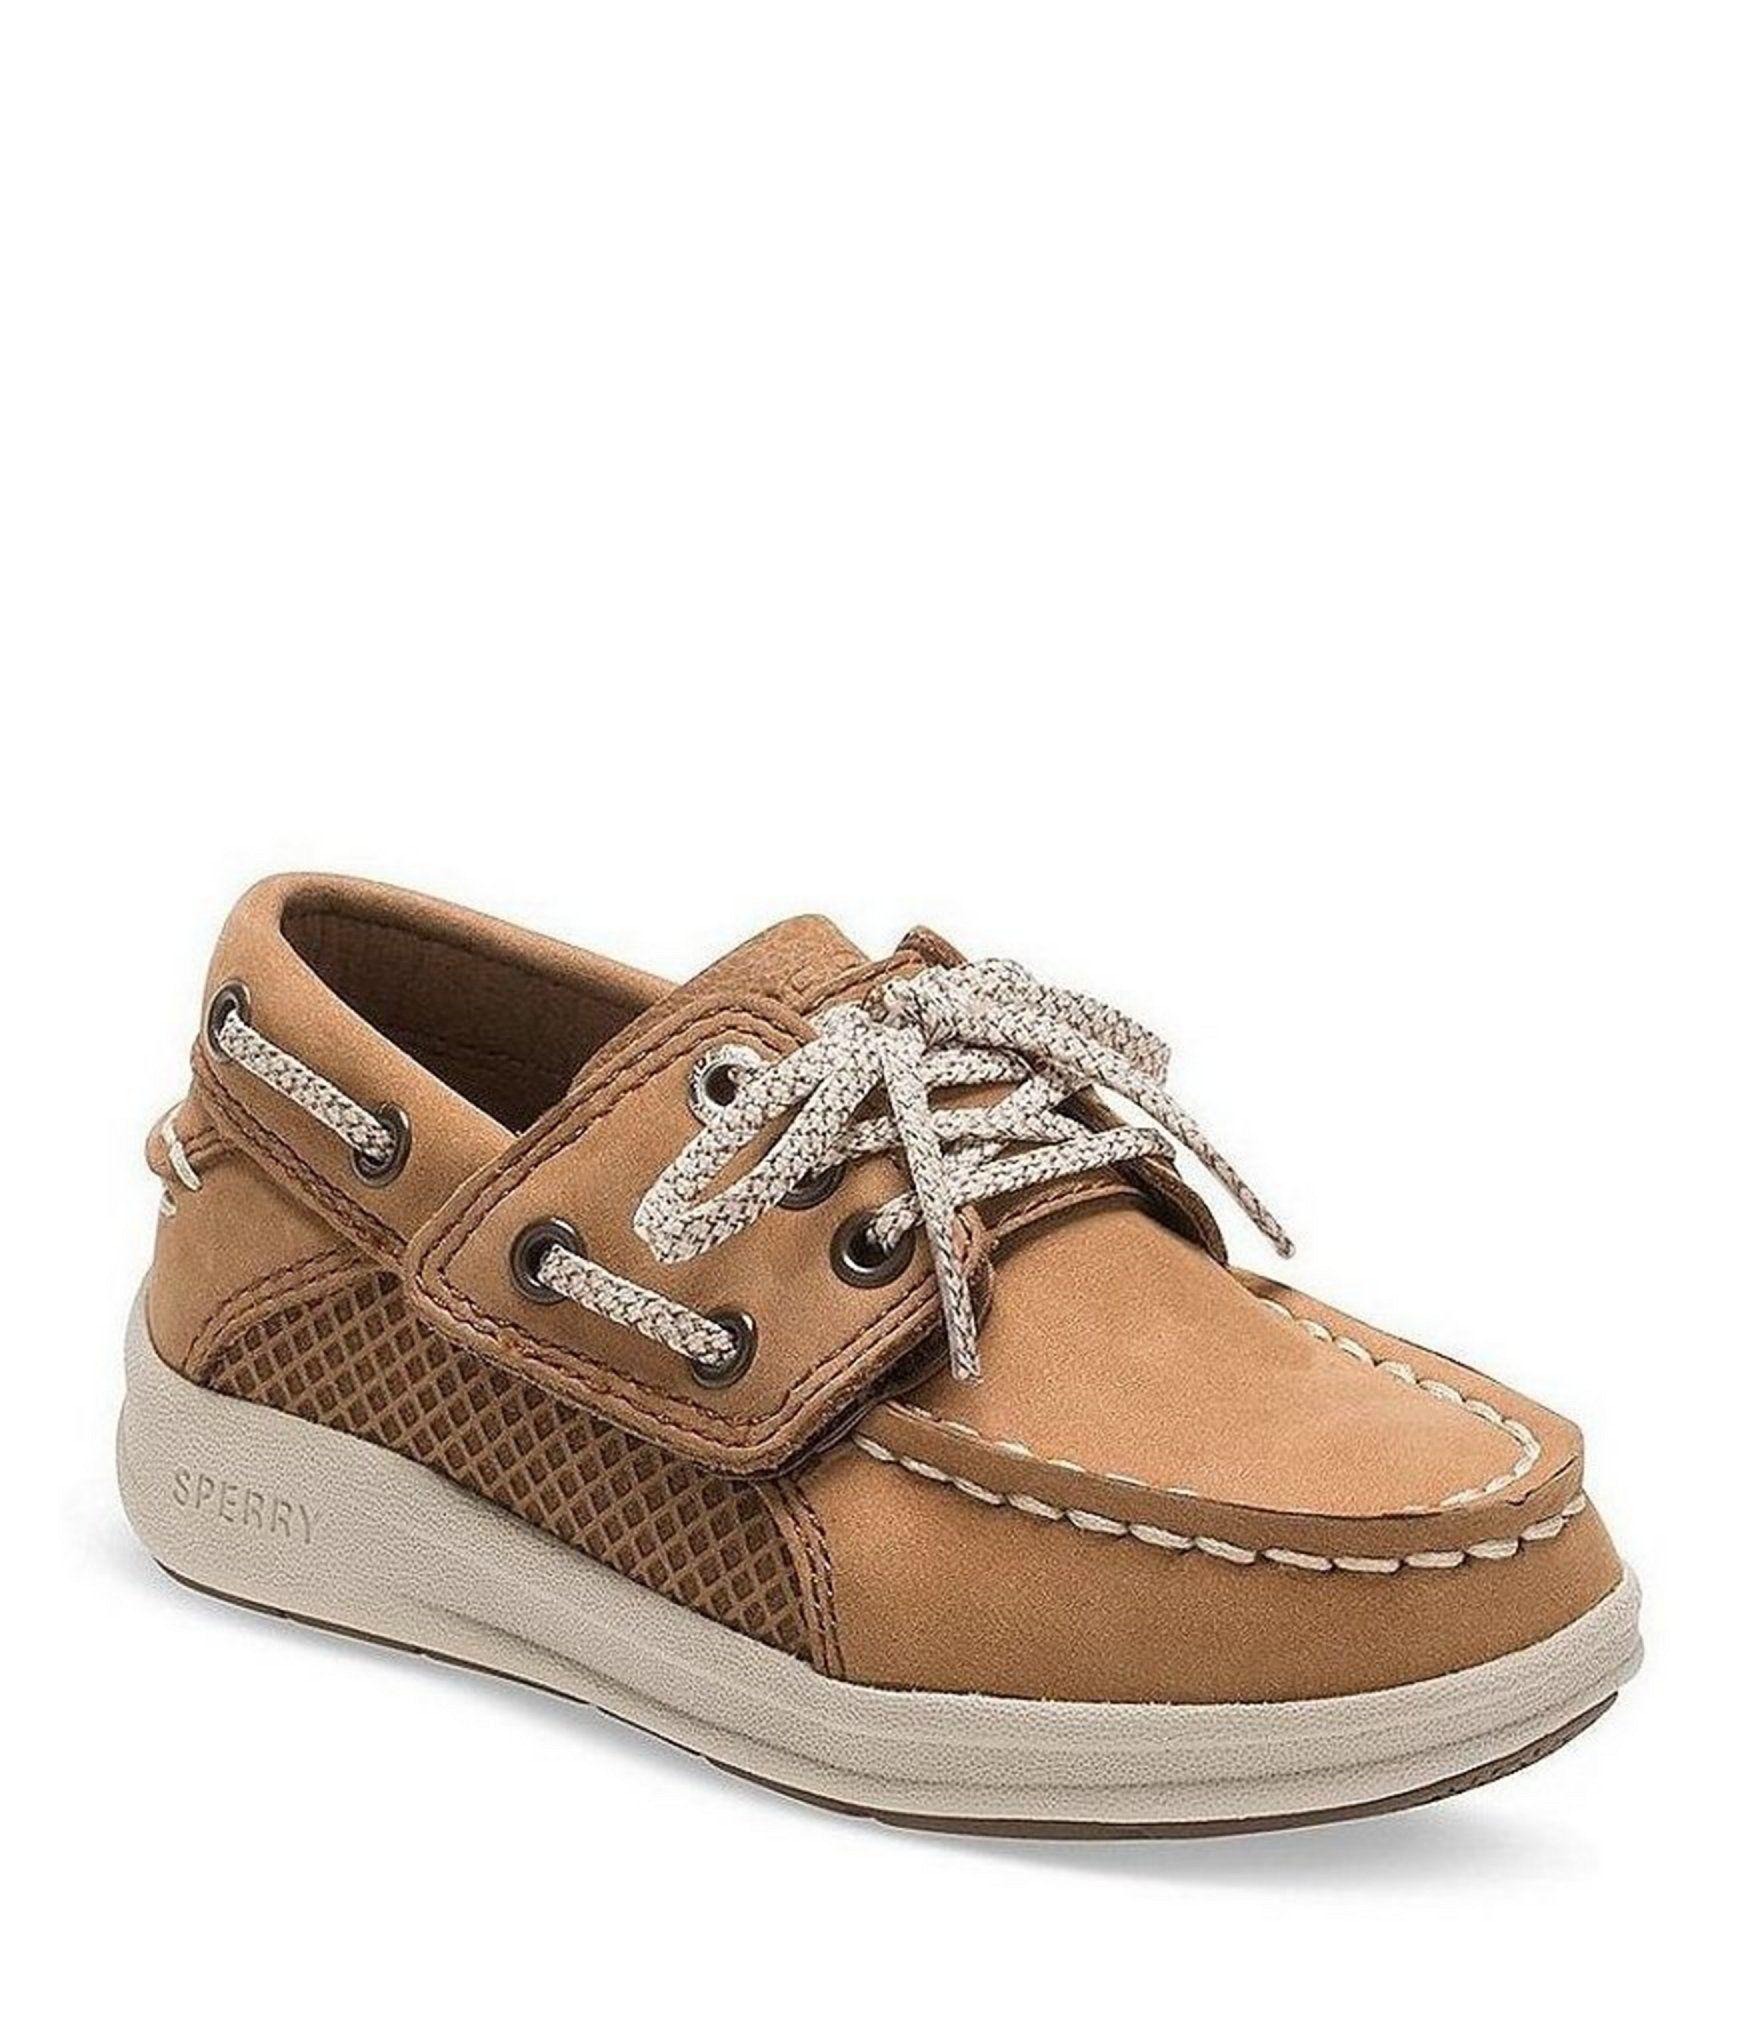 Sperry Boys' Gamefish Jr Boat Shoes - Dark Tan 5W Infant ...